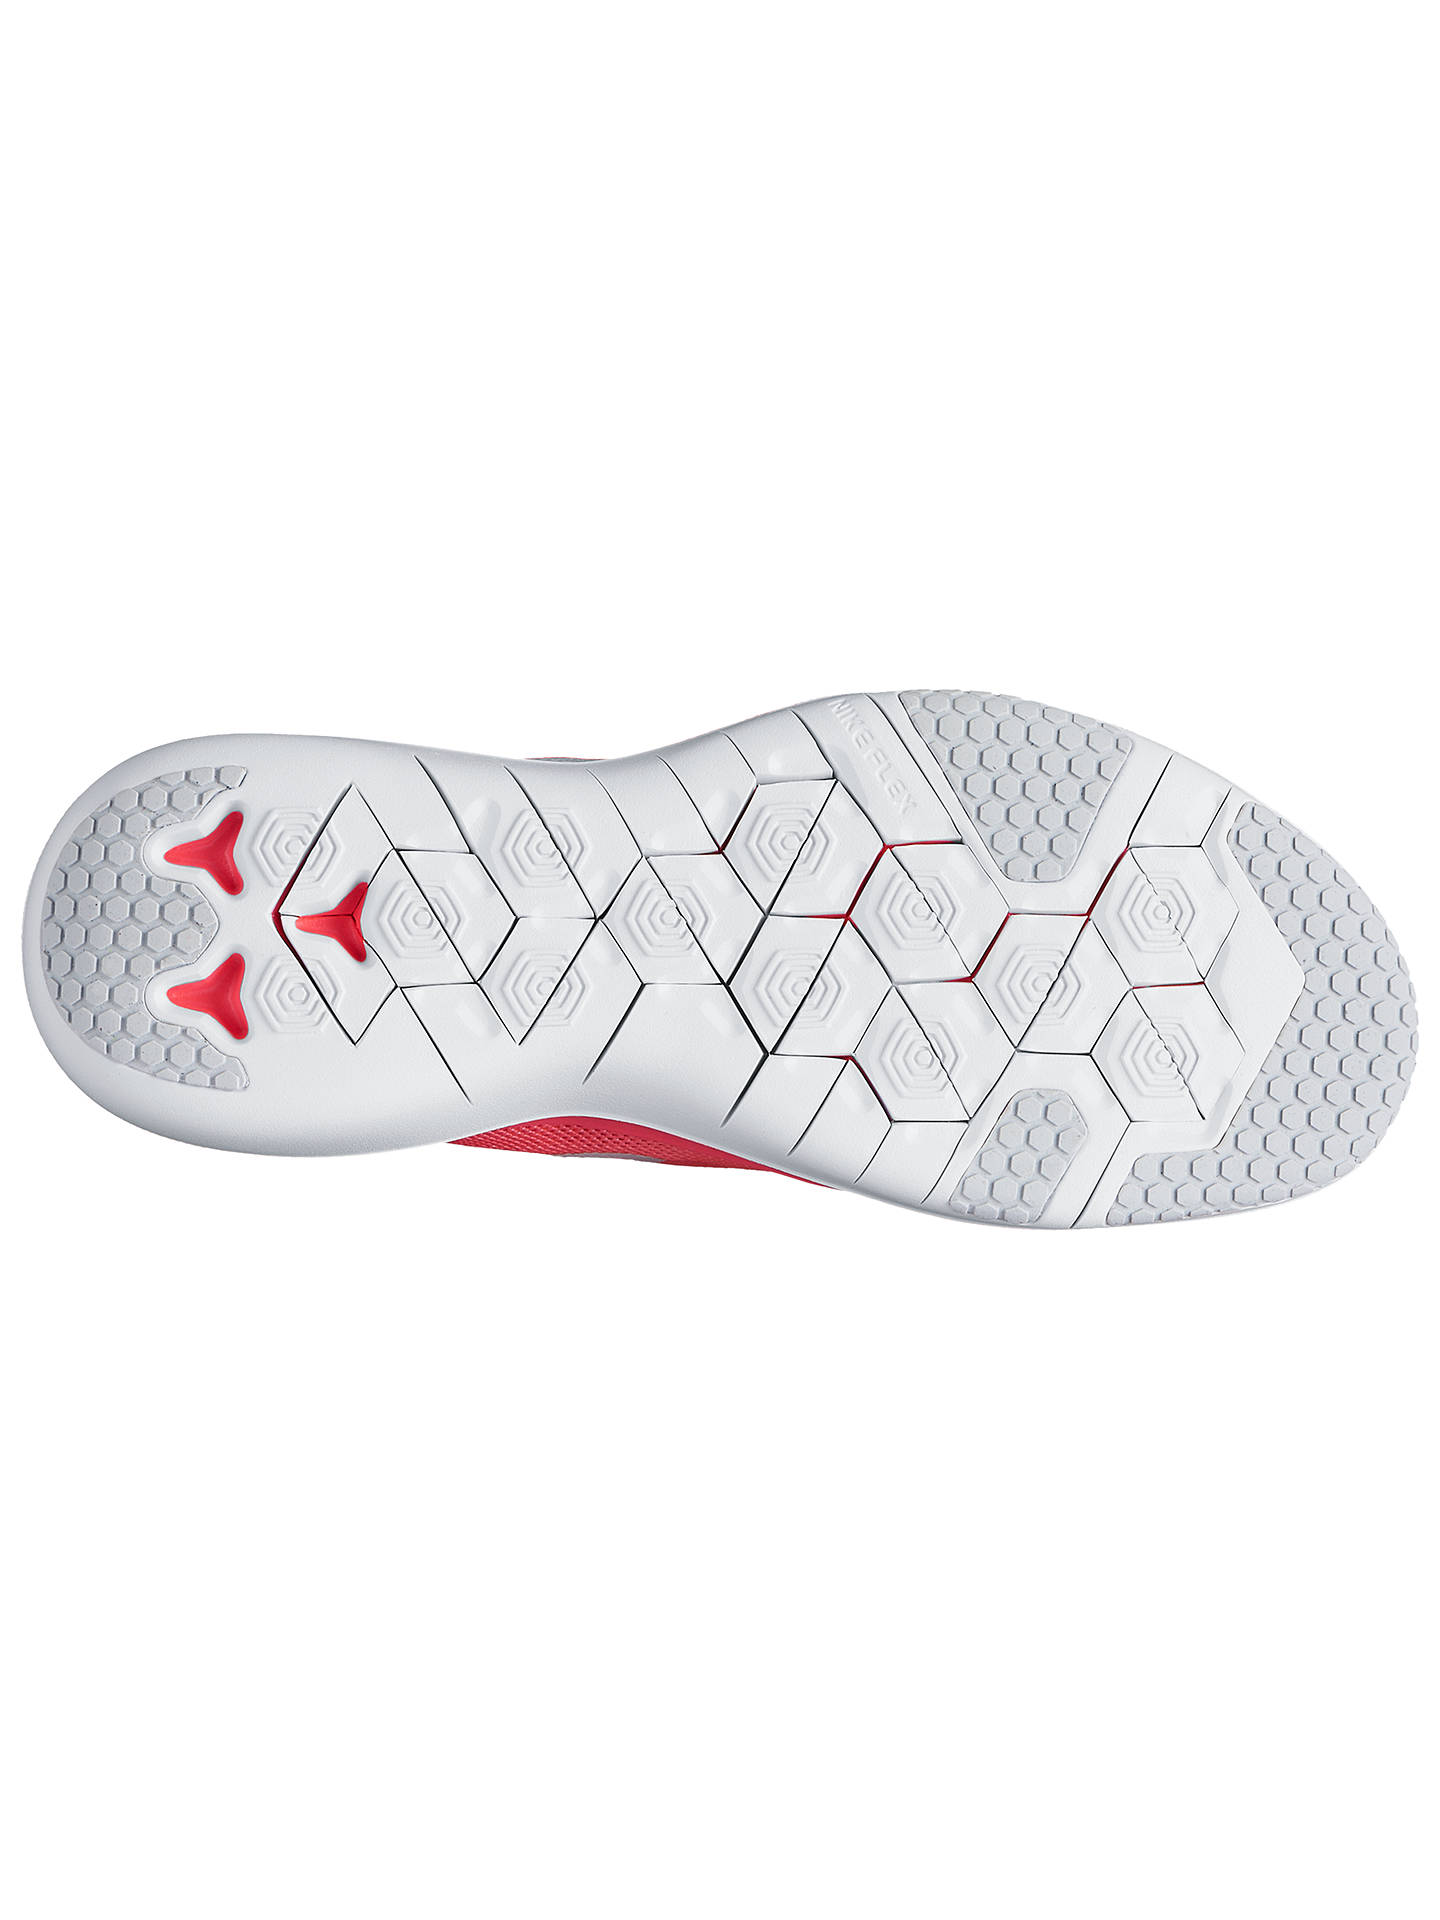 33f36156a71c Nike Flex Supreme TR 5 Women s Cross Trainers at John Lewis   Partners